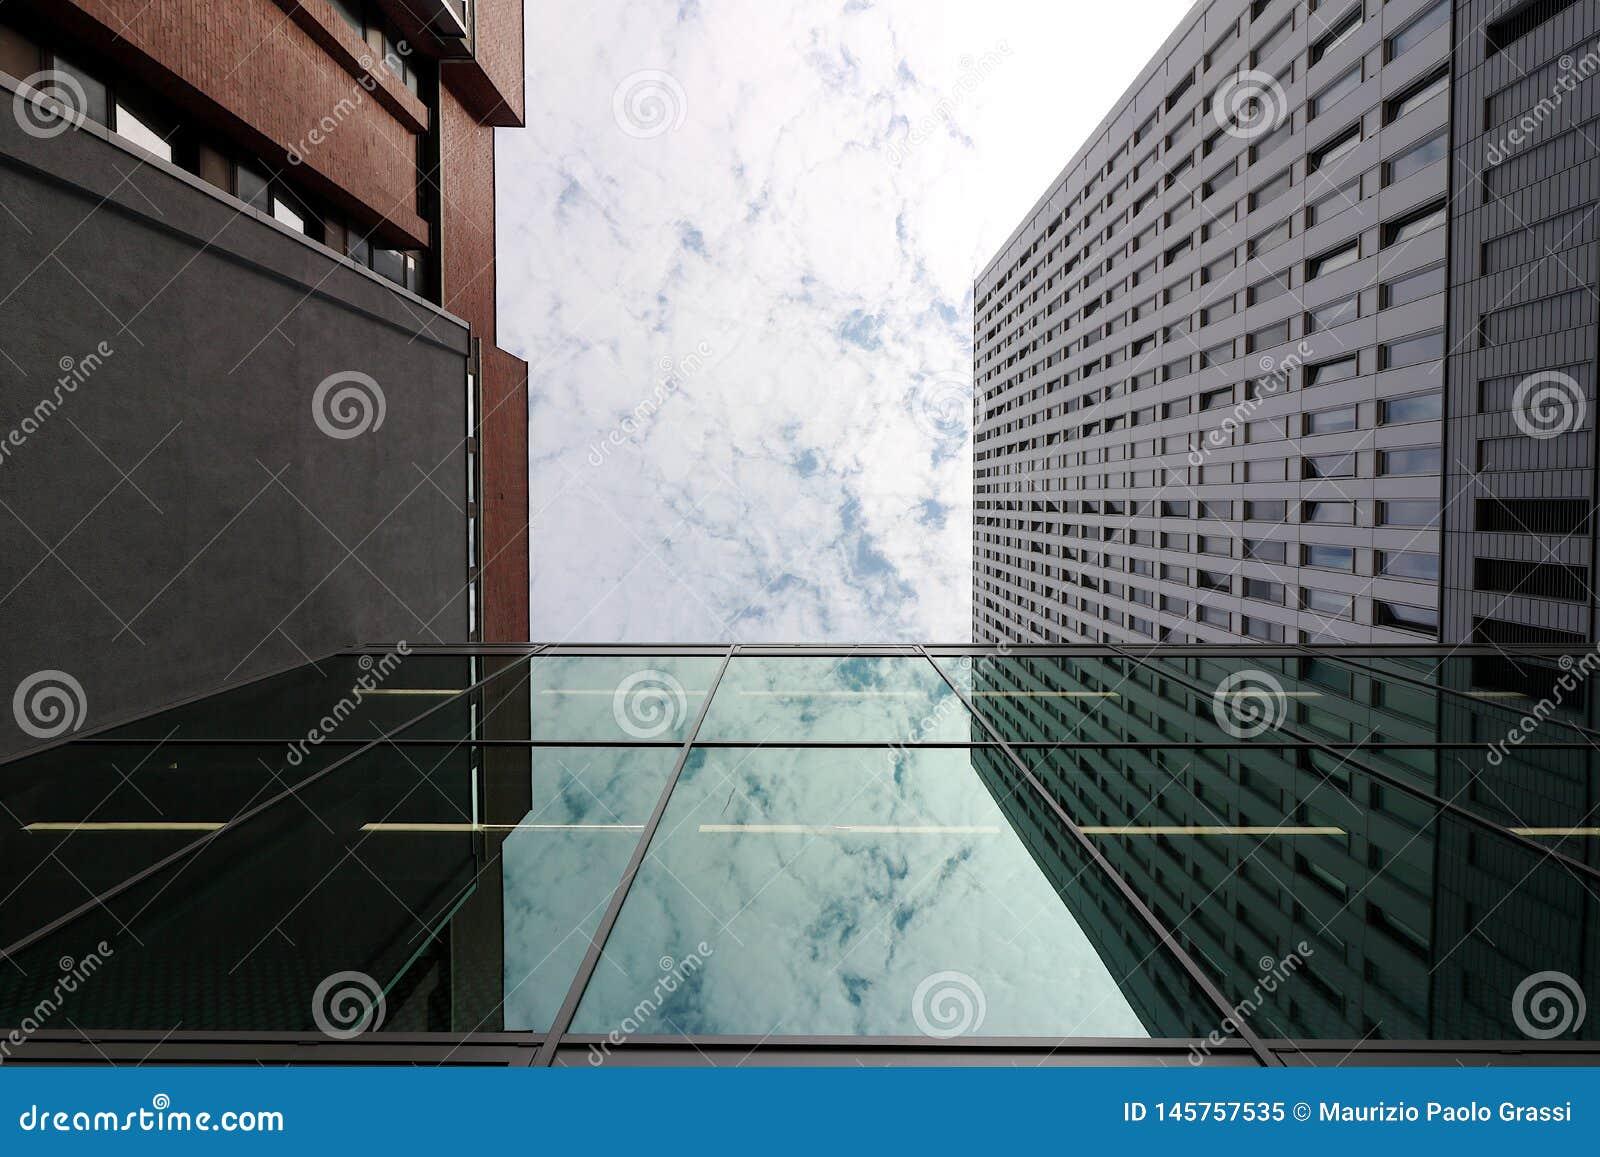 Berlin, Germany, 13 June 2018. Modern buildings of the new Berlin. The sky is mirrored in a window